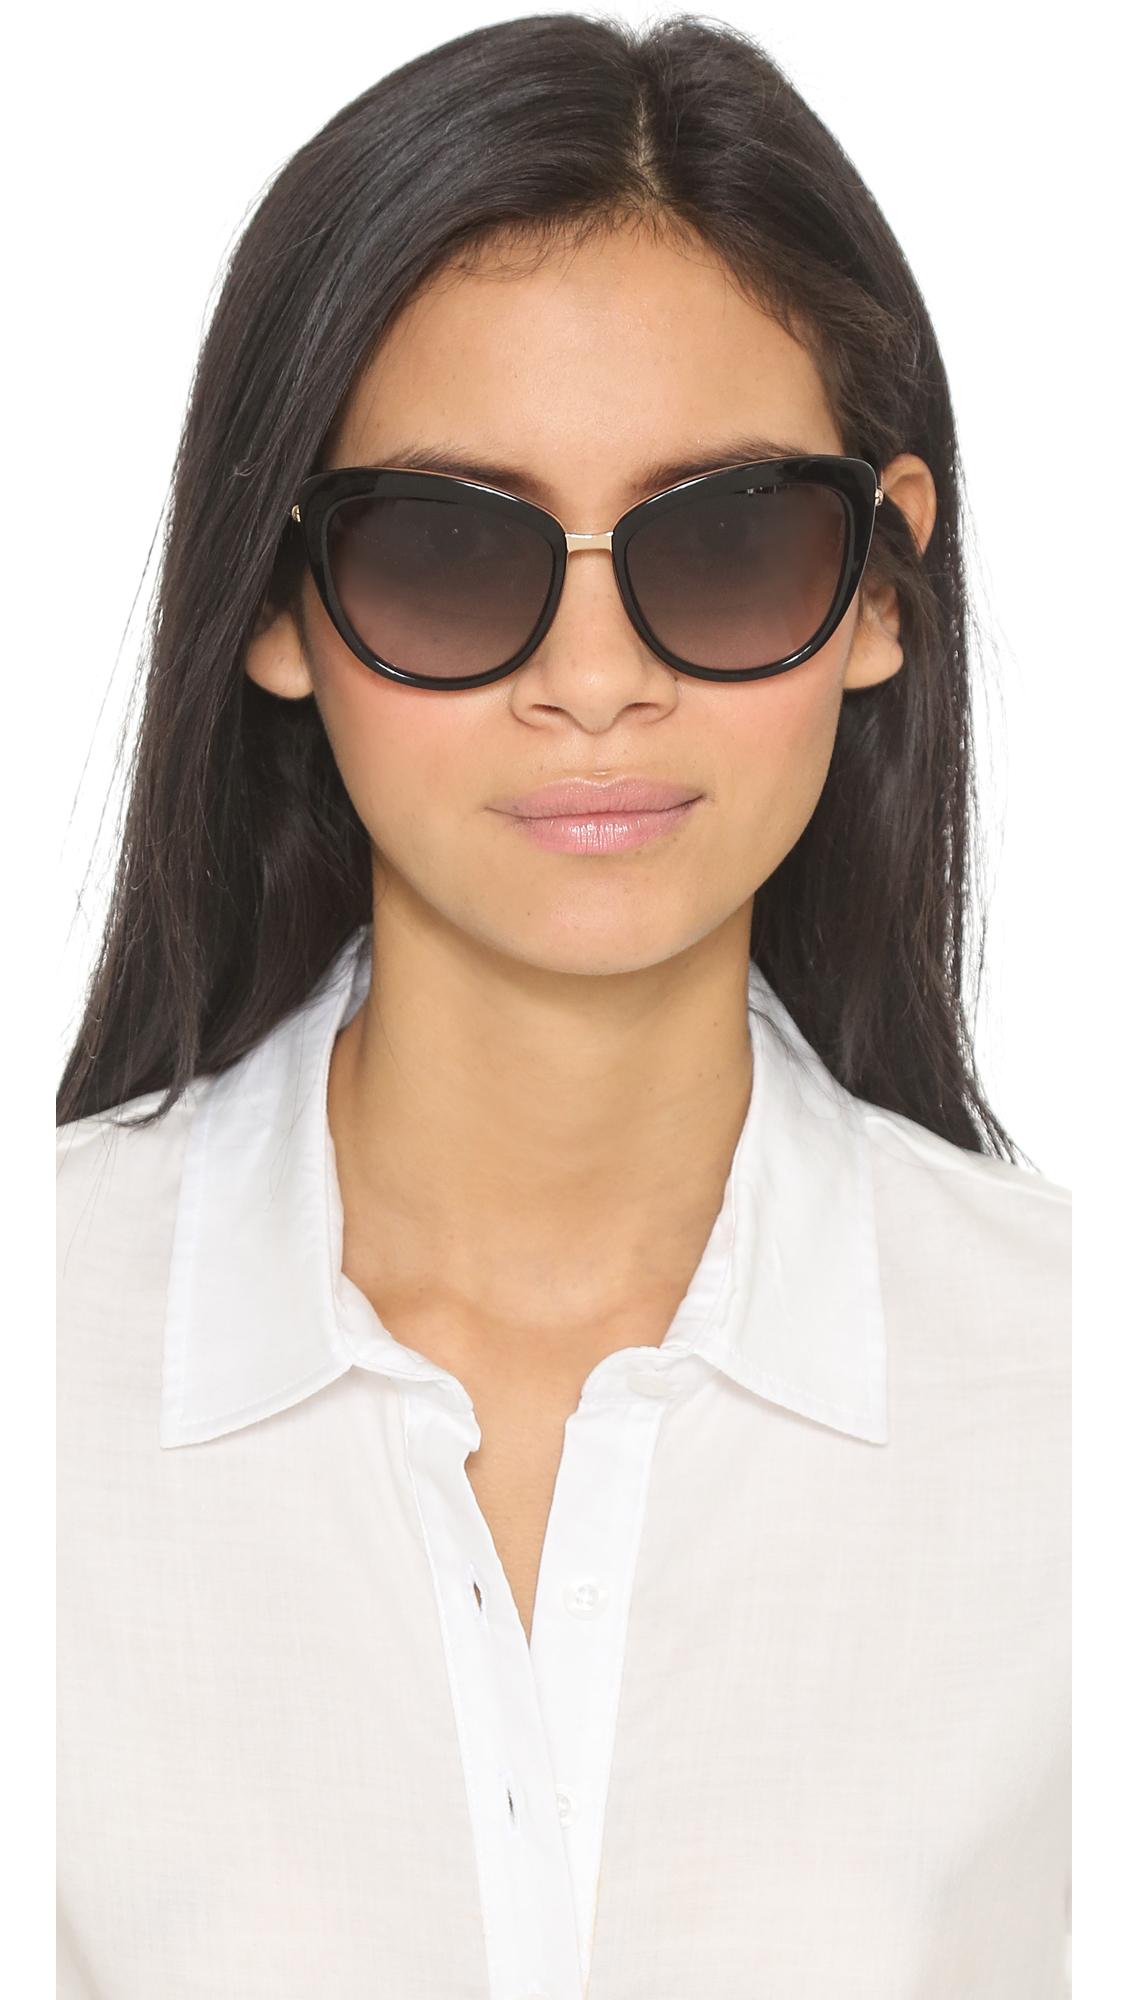 88704d69f4afe Lyst - Kate Spade Kandi Sunglasses in Black